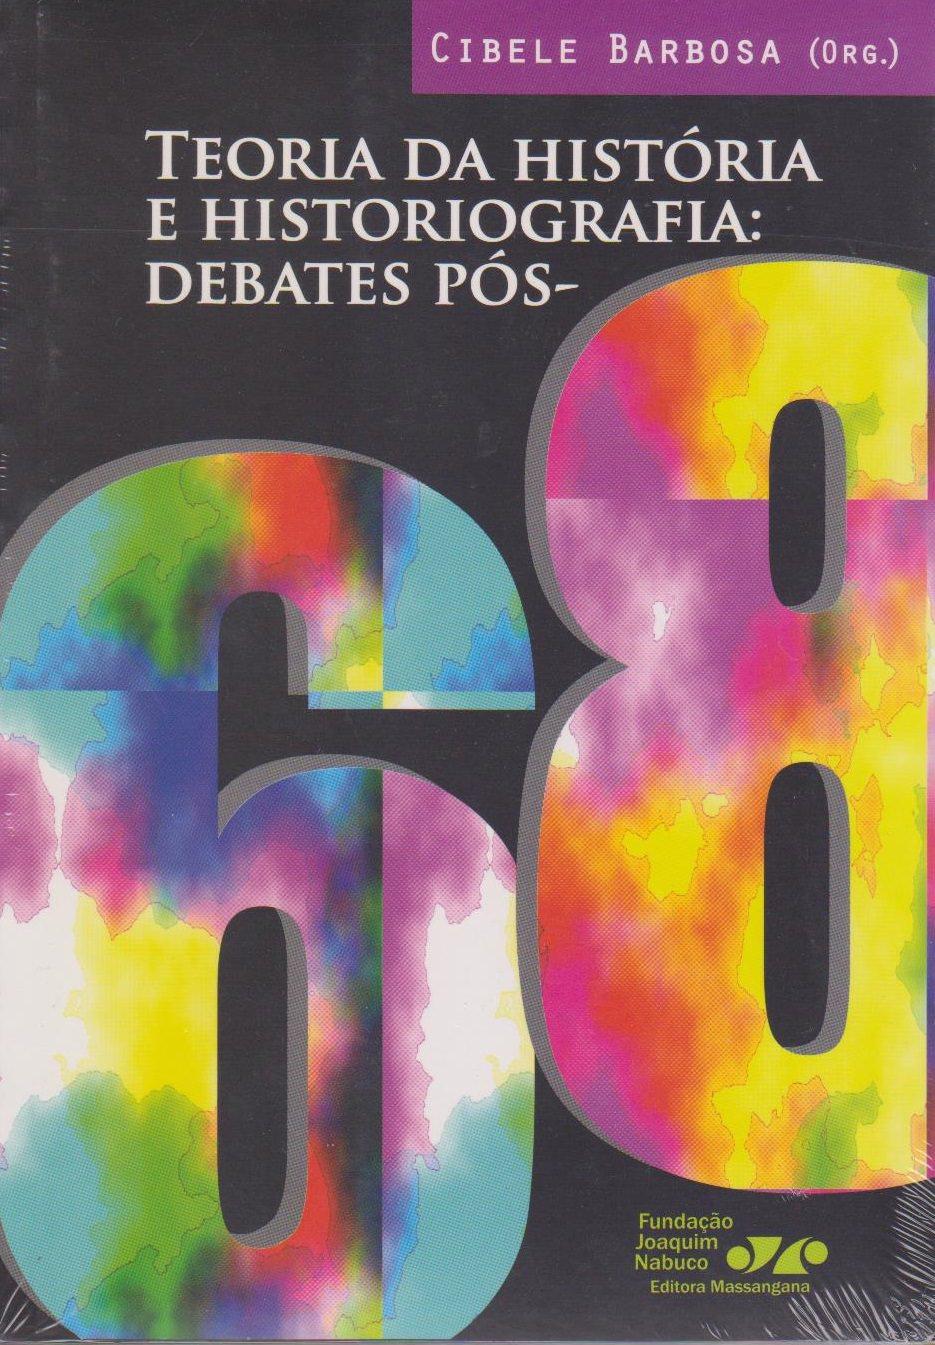 Teoria da história e historiografia: debates pós-68, livro de Cibele Barbosa (org.)